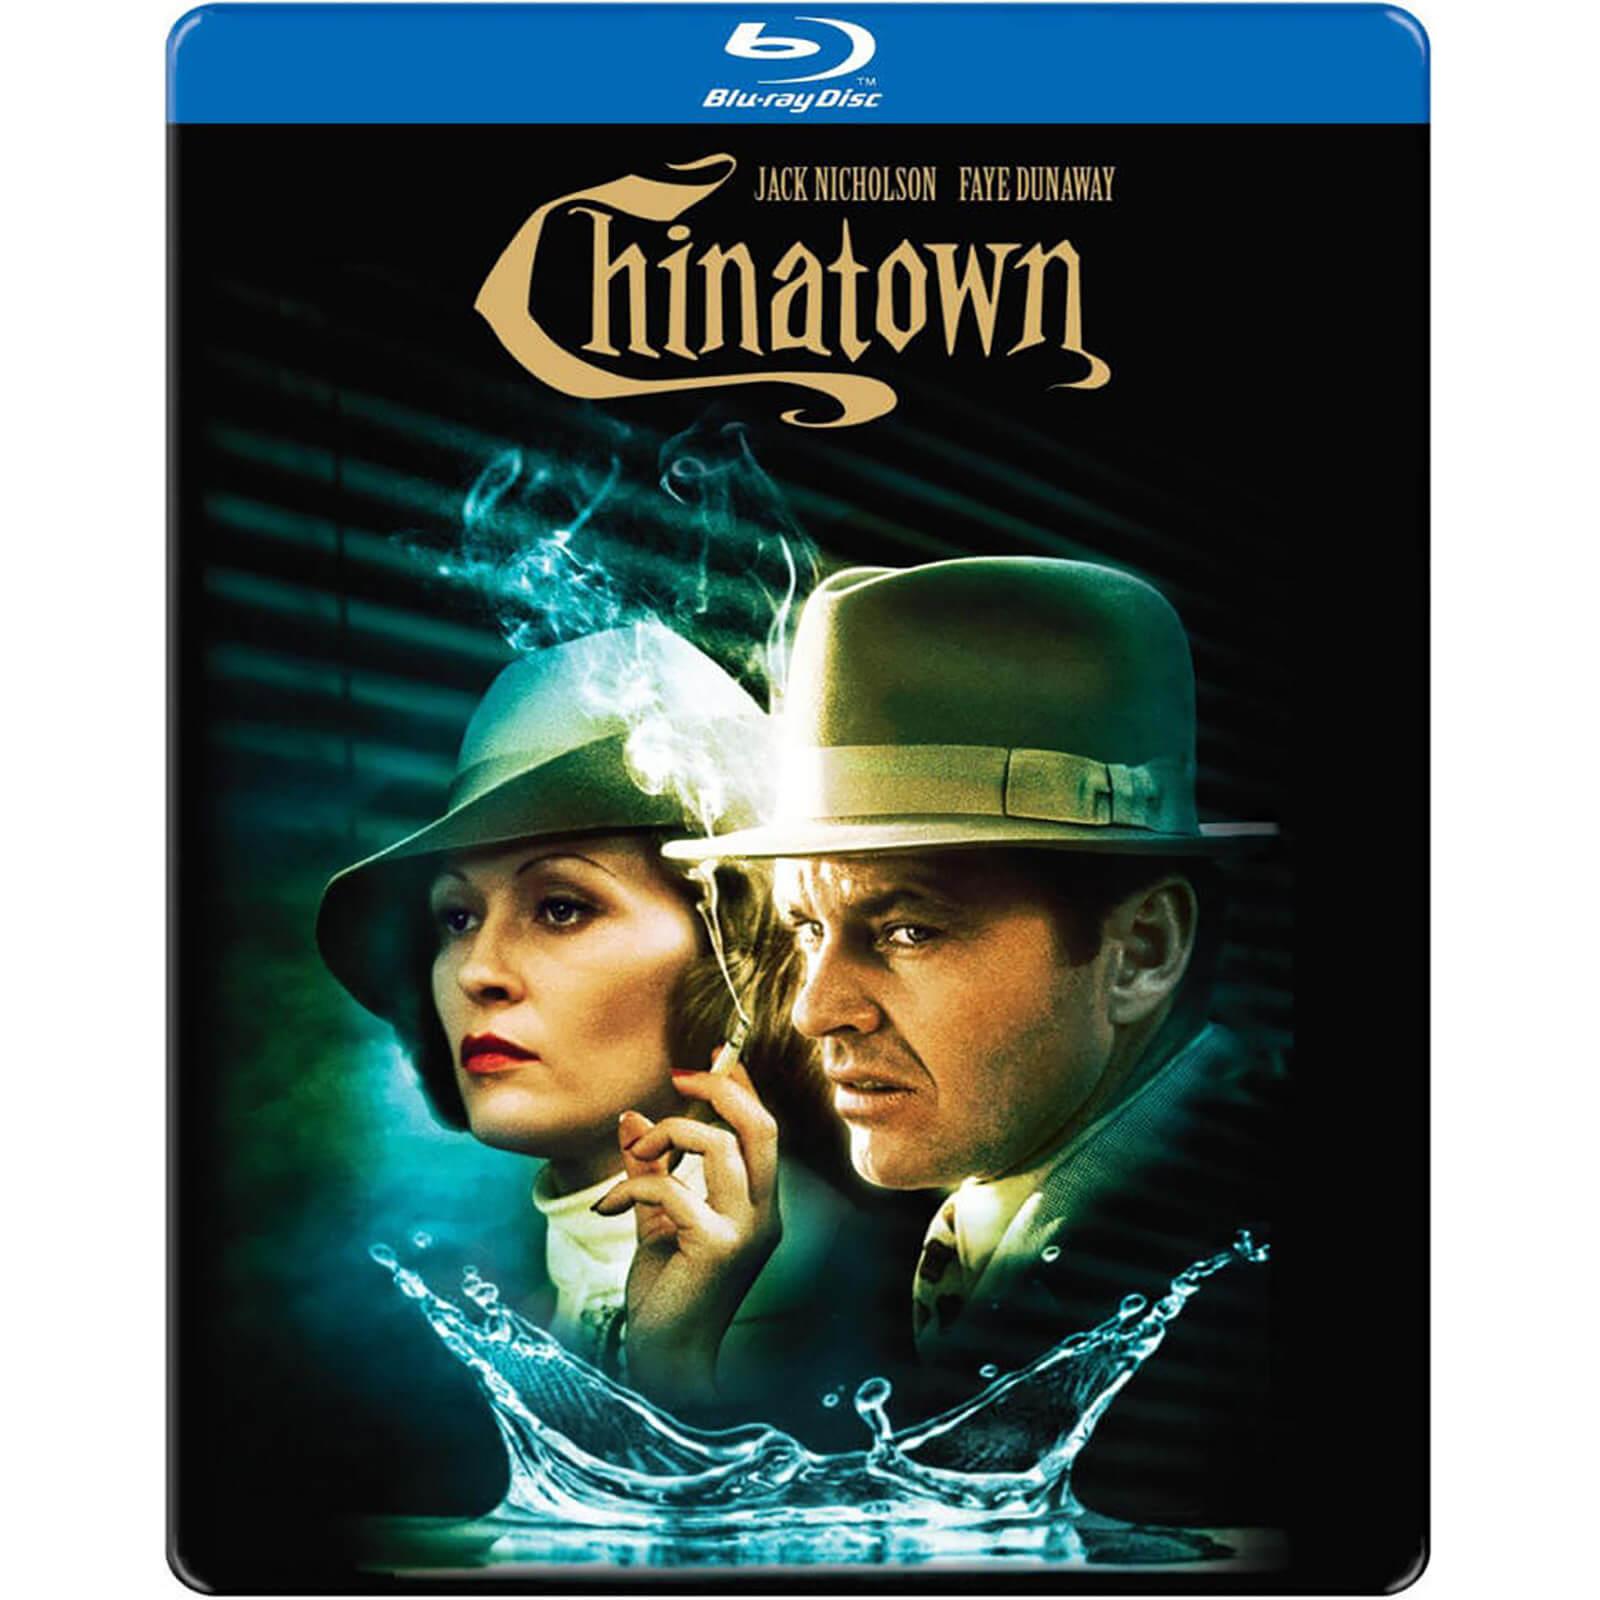 Chinatown - Import - Limited Edition Steelbook (Region 1)